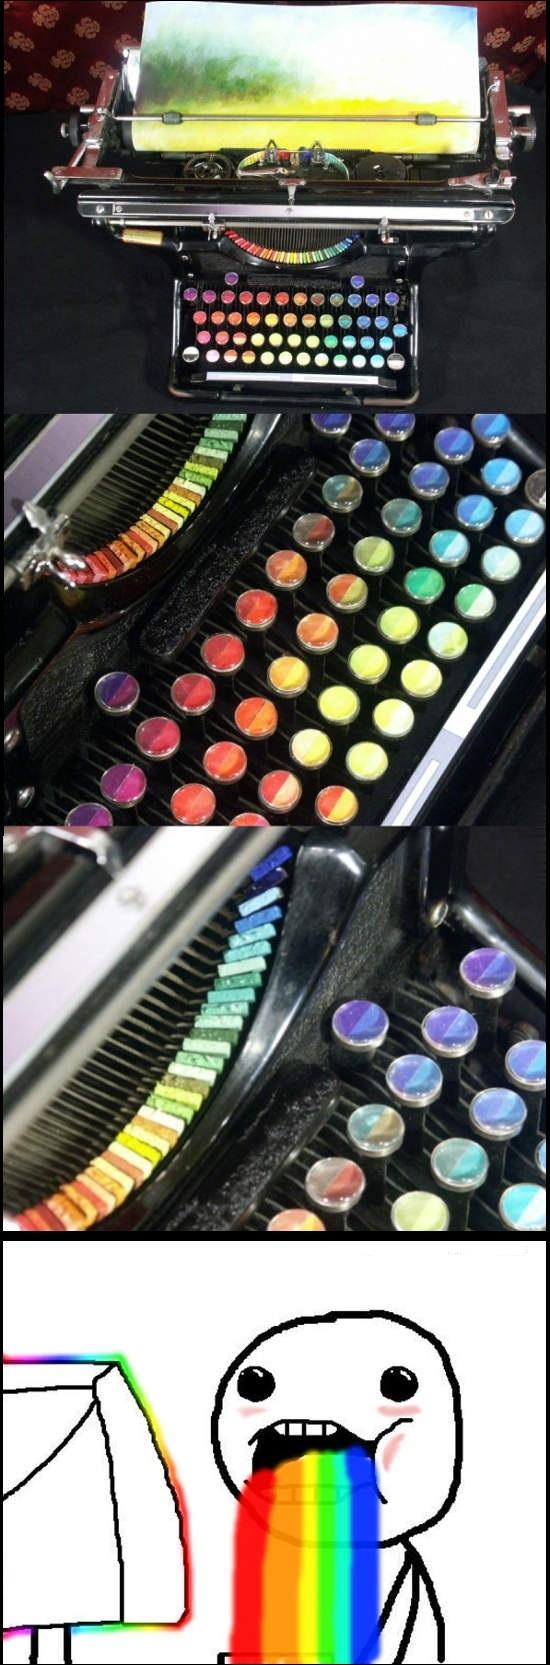 Puke_rainbows - La máquina de escribir de Puke Rainbows